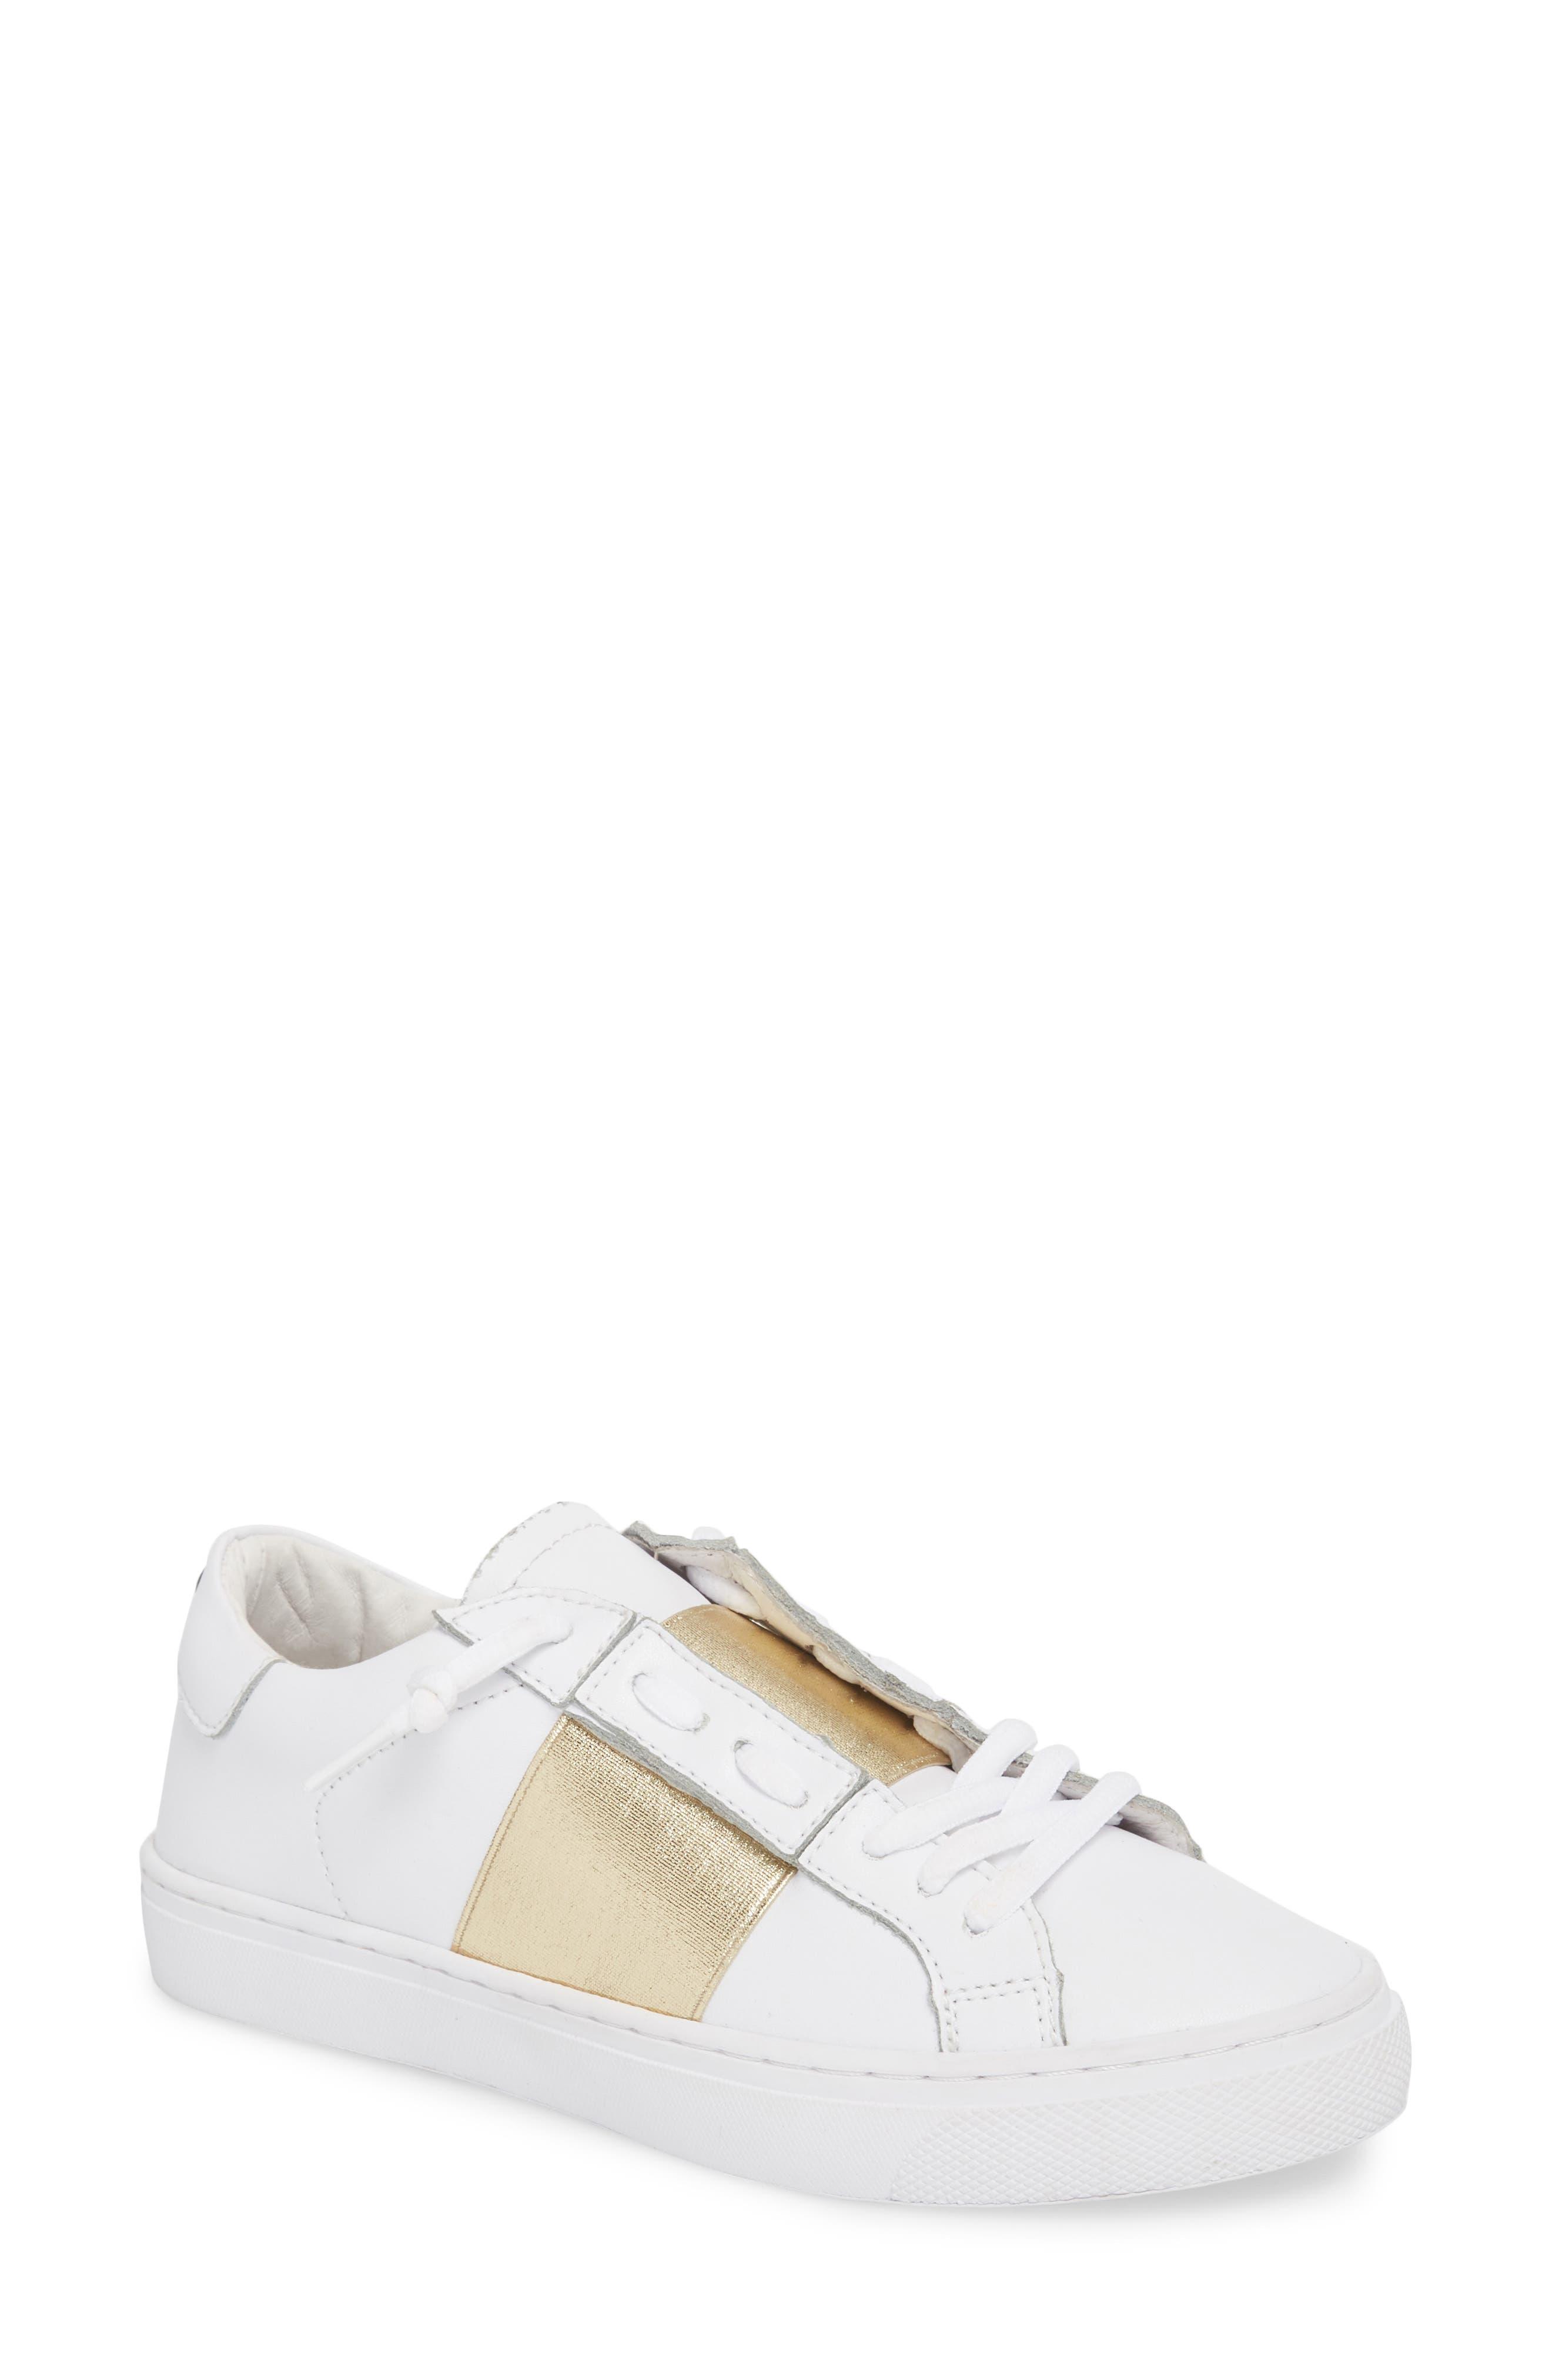 Slip-On Sneaker,                             Main thumbnail 1, color,                             Gold Elastic Leather